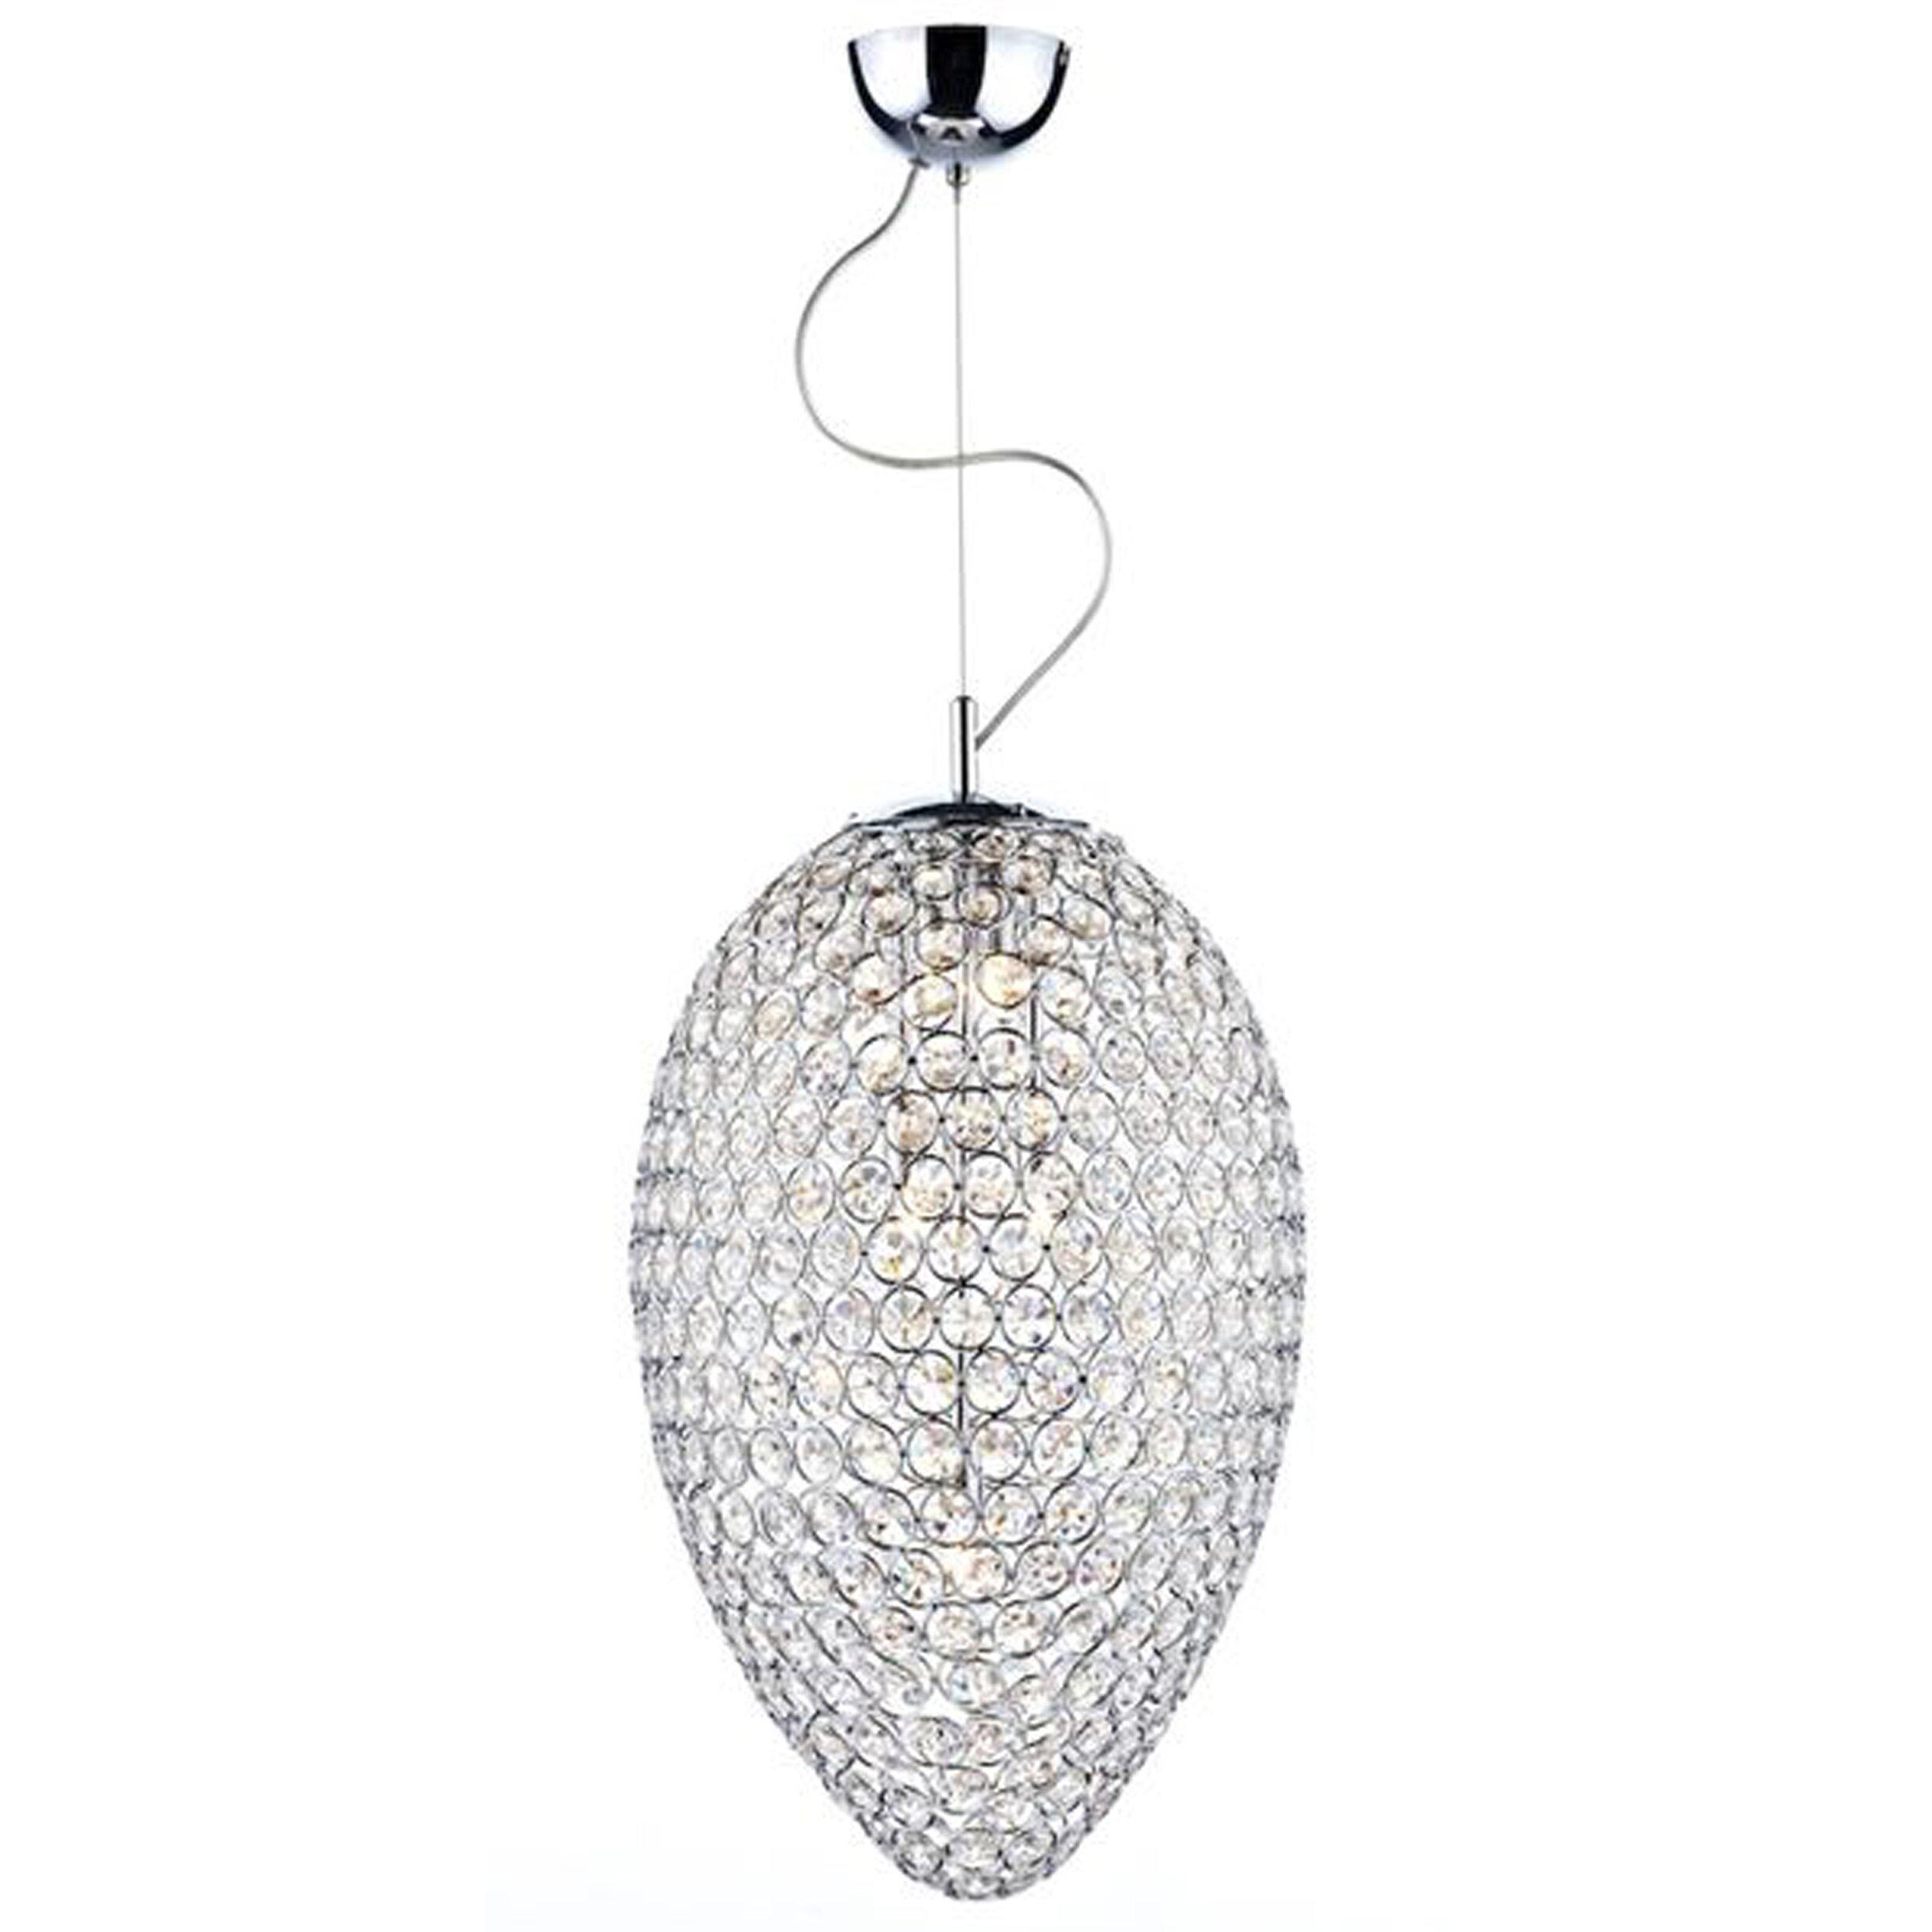 Warehouse of tiffany orai 5 light crystal chandelier Warehouse of tiffany